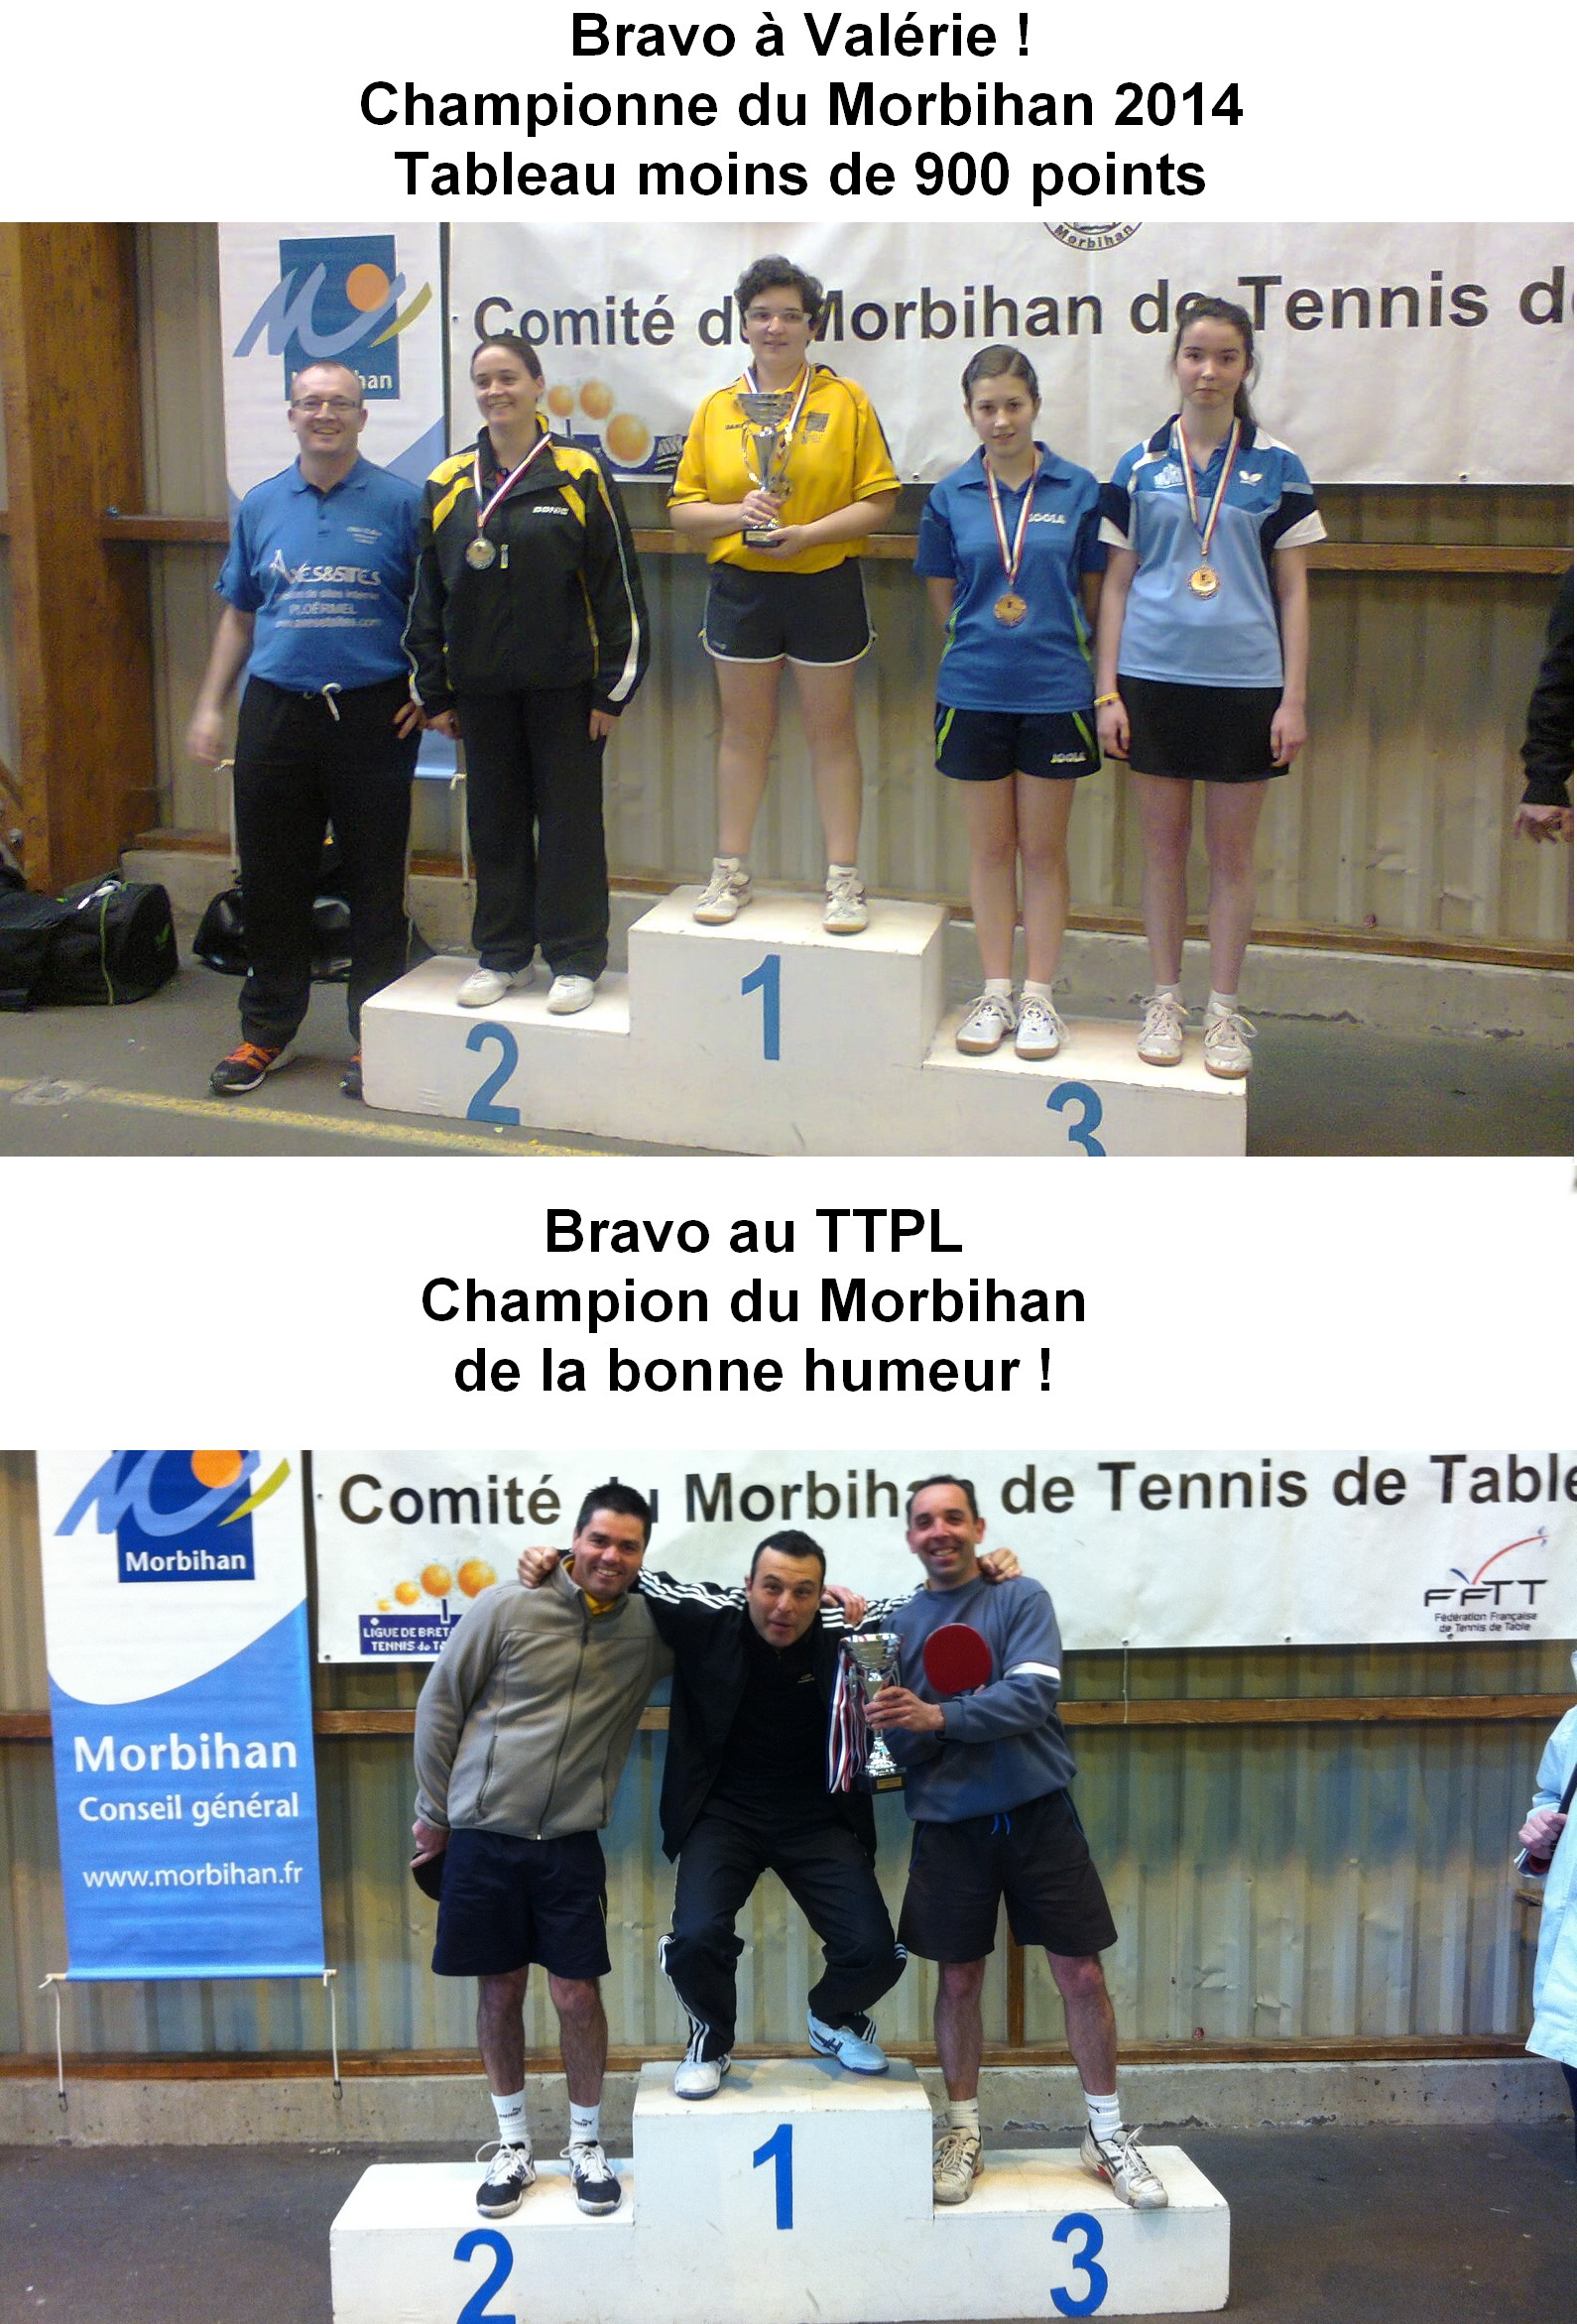 championnat du Morbihan 2014